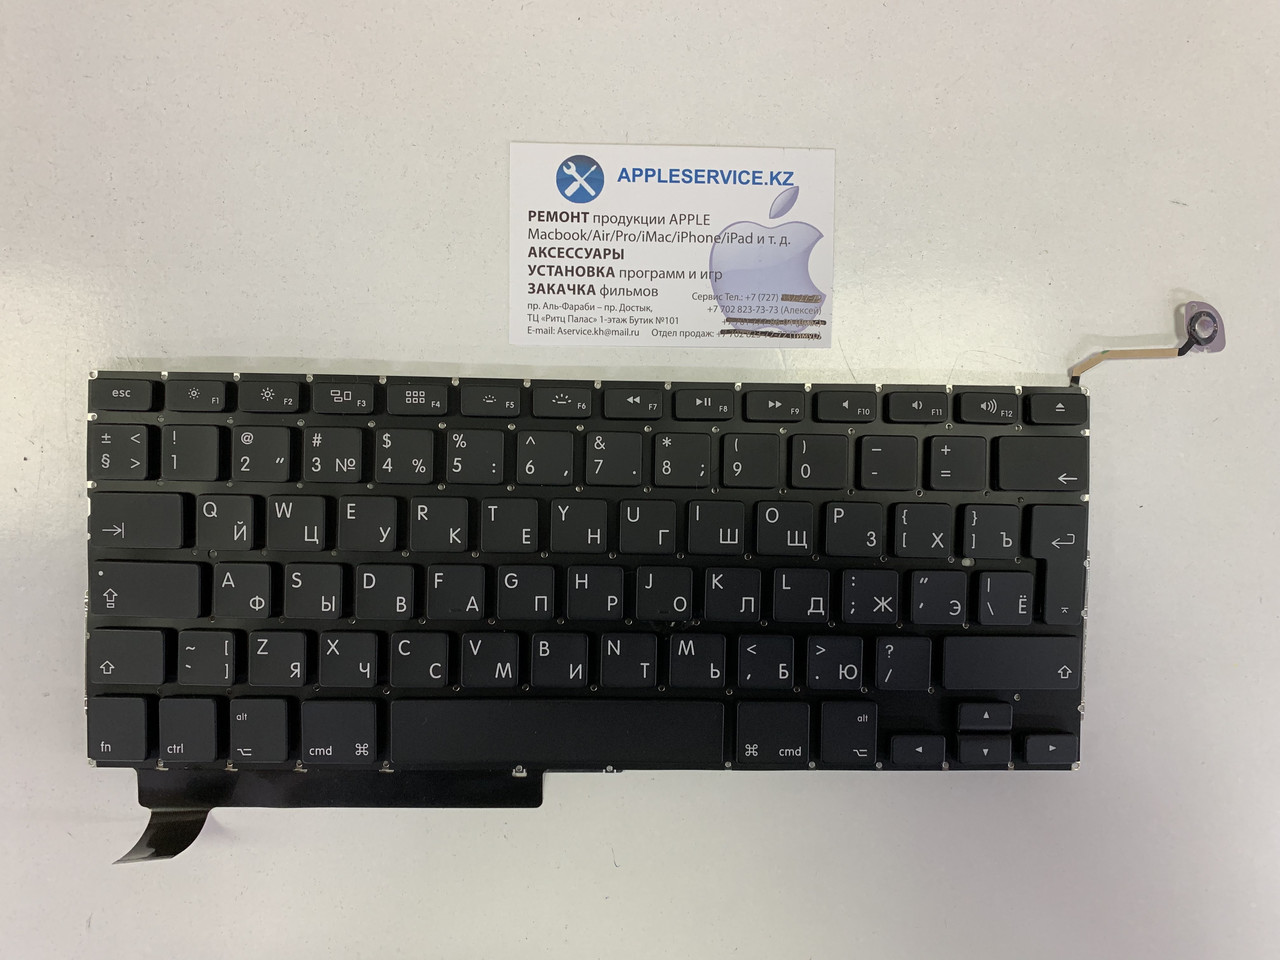 Клавиатура Ru/En на Macbook Pro 15 A1286